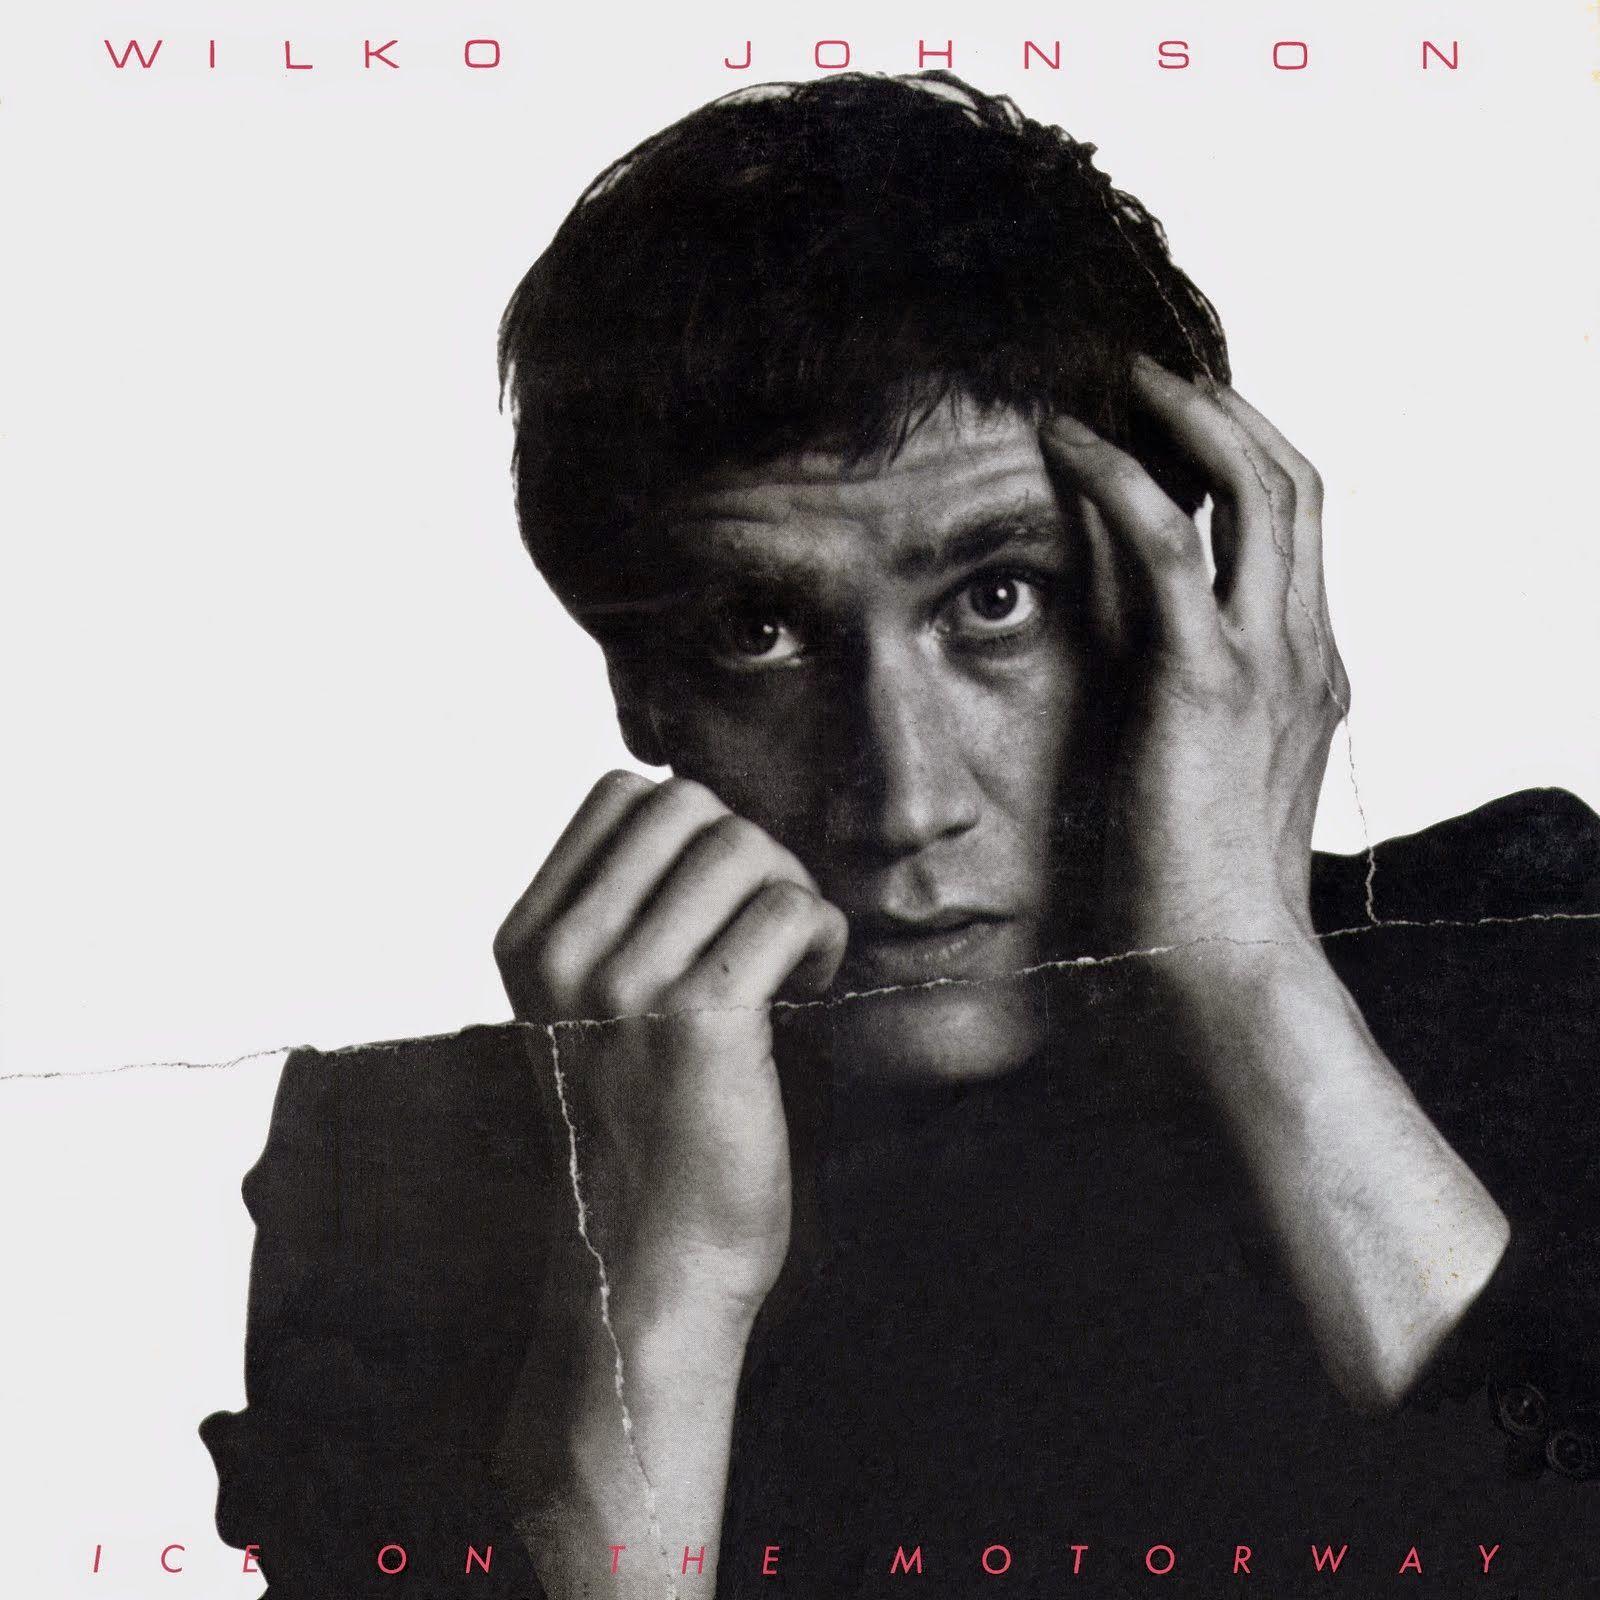 WILKO JOHNSON - Ice on the motorway (1980) http://www.woodyjagger.com/2015/04/wilko-johnson-ice-on-motorway-1980.html